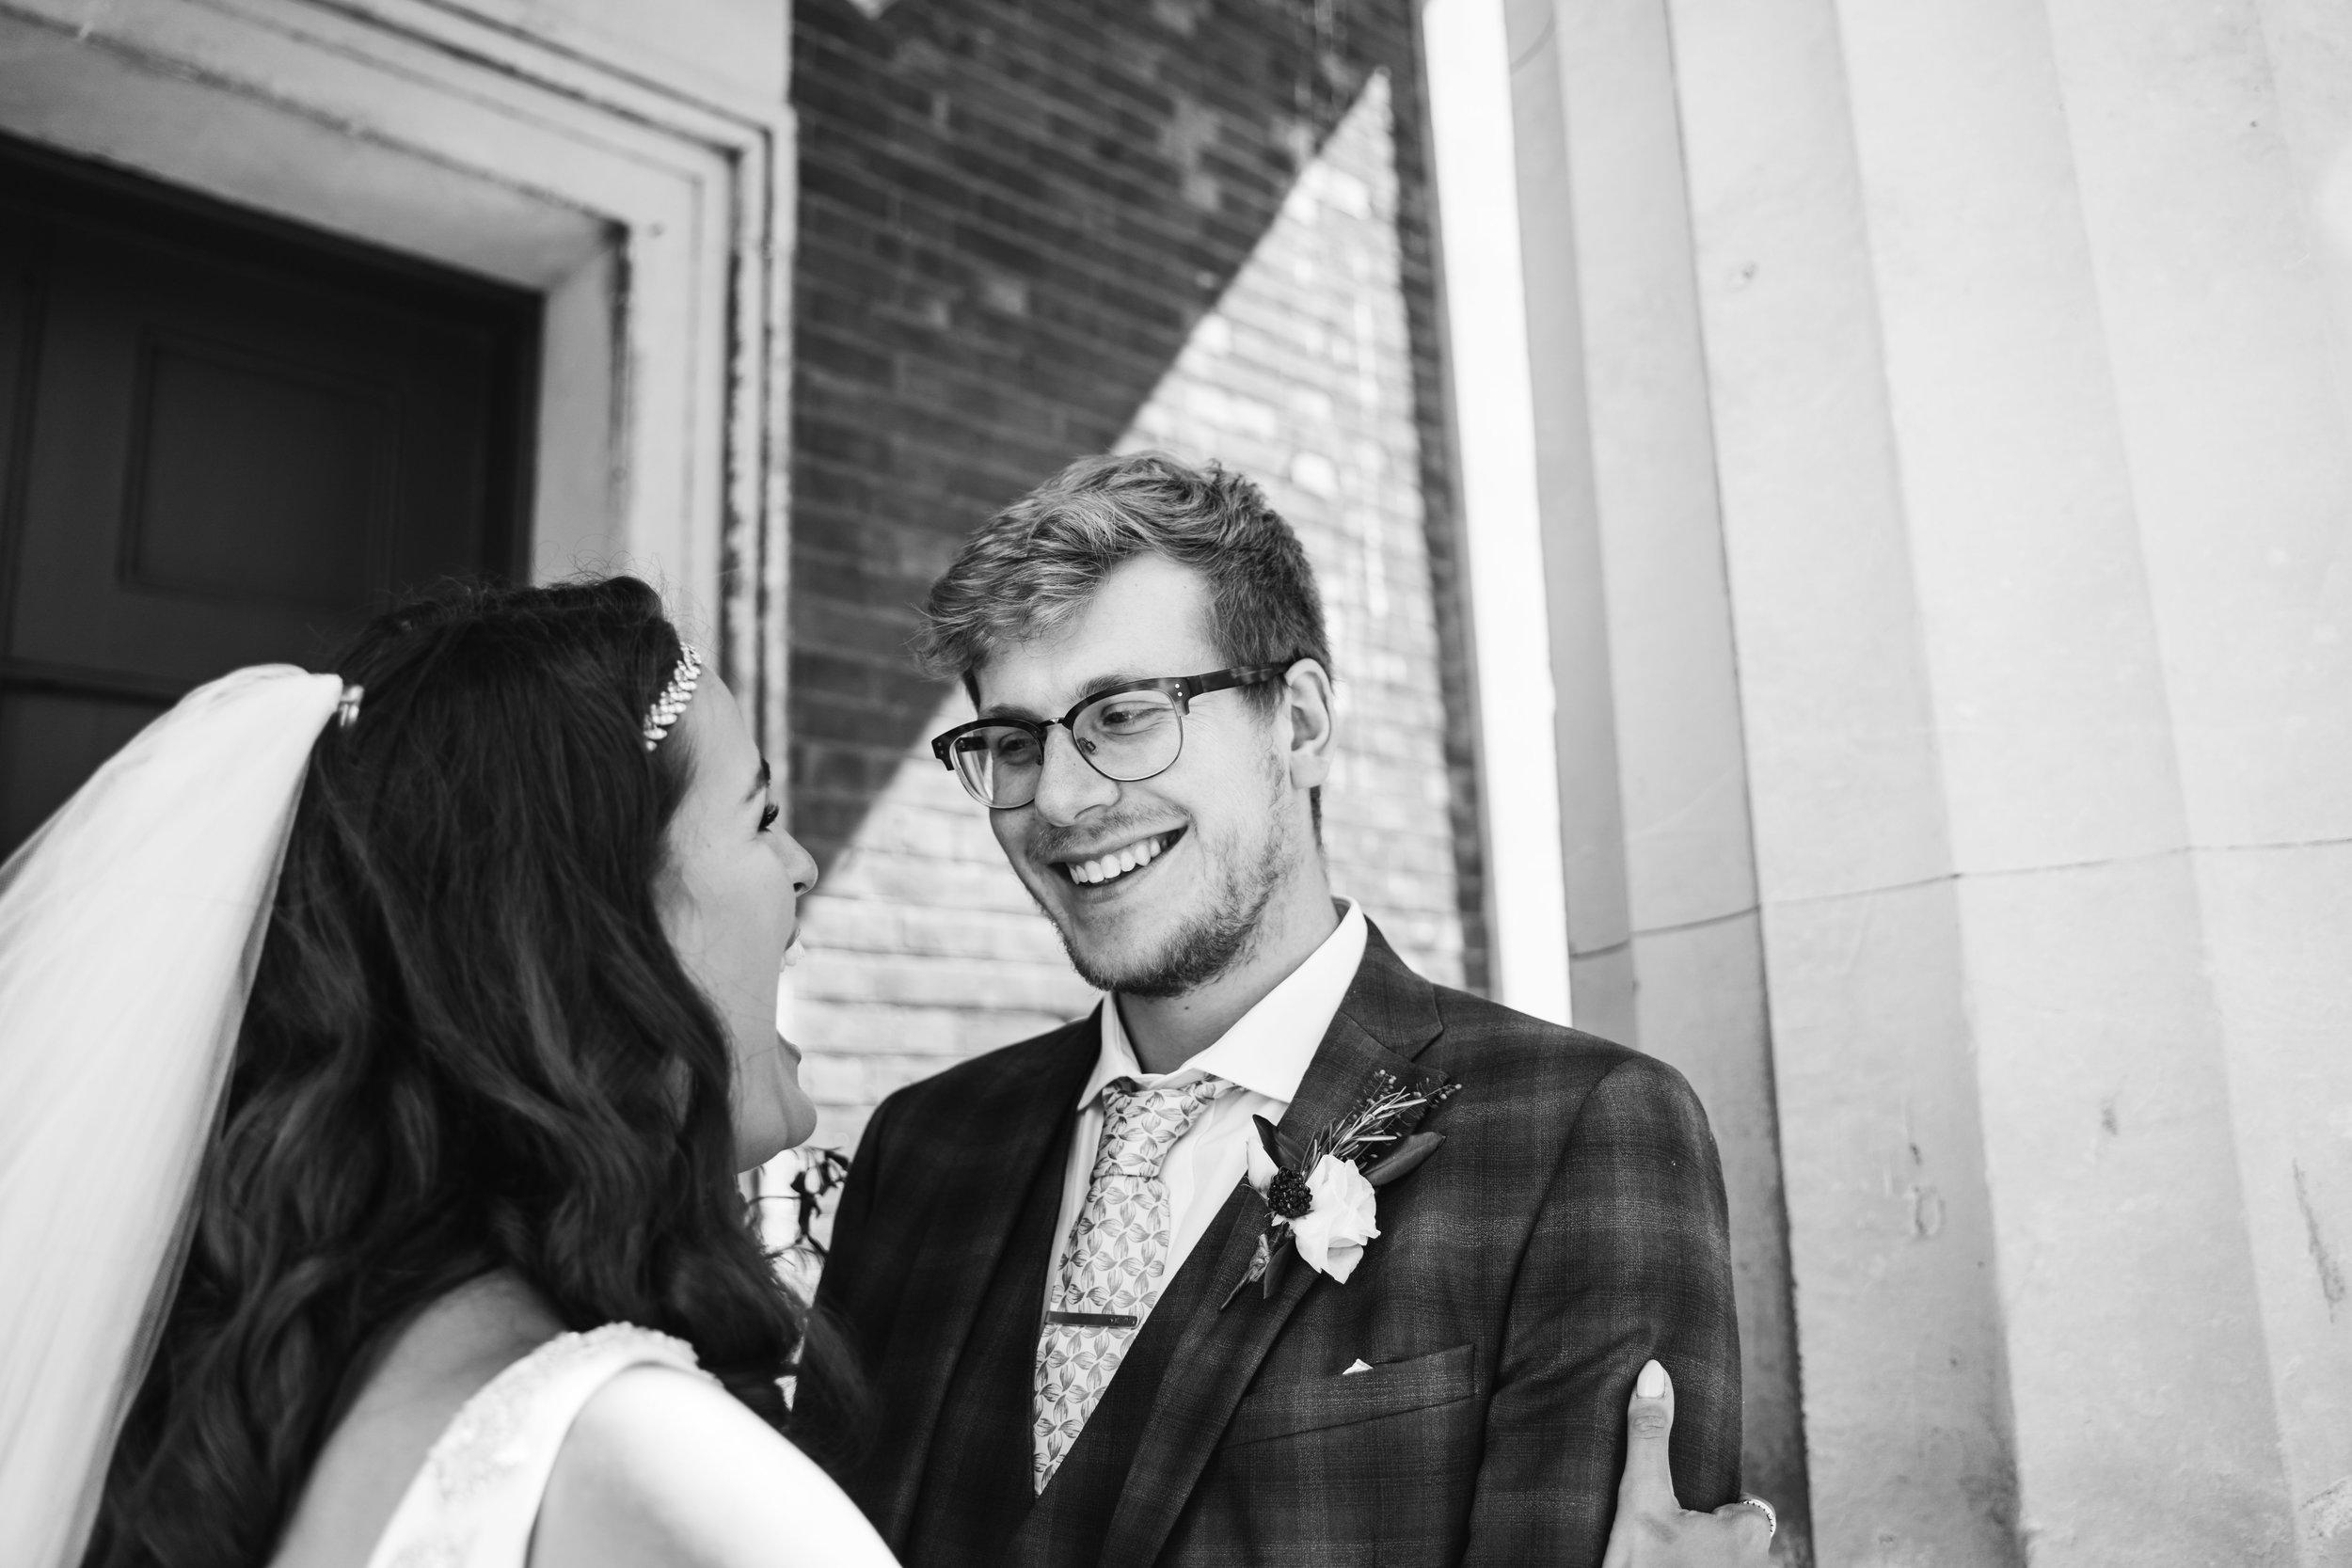 kent-wedding-photographer-107998.jpg